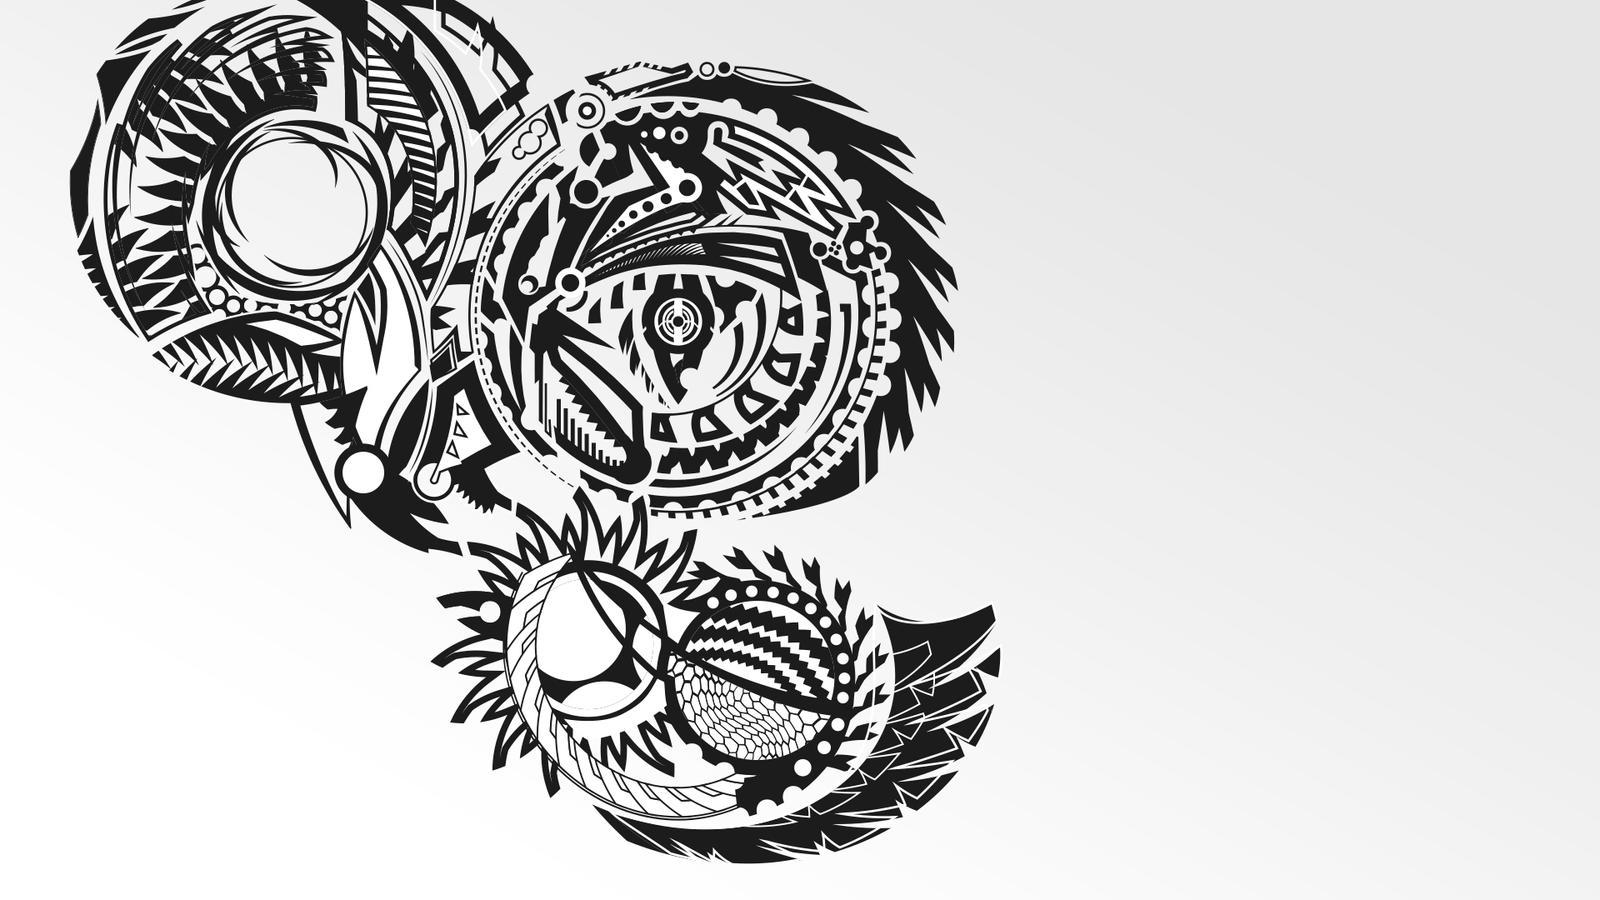 maori art iphone wallpaper - photo #31